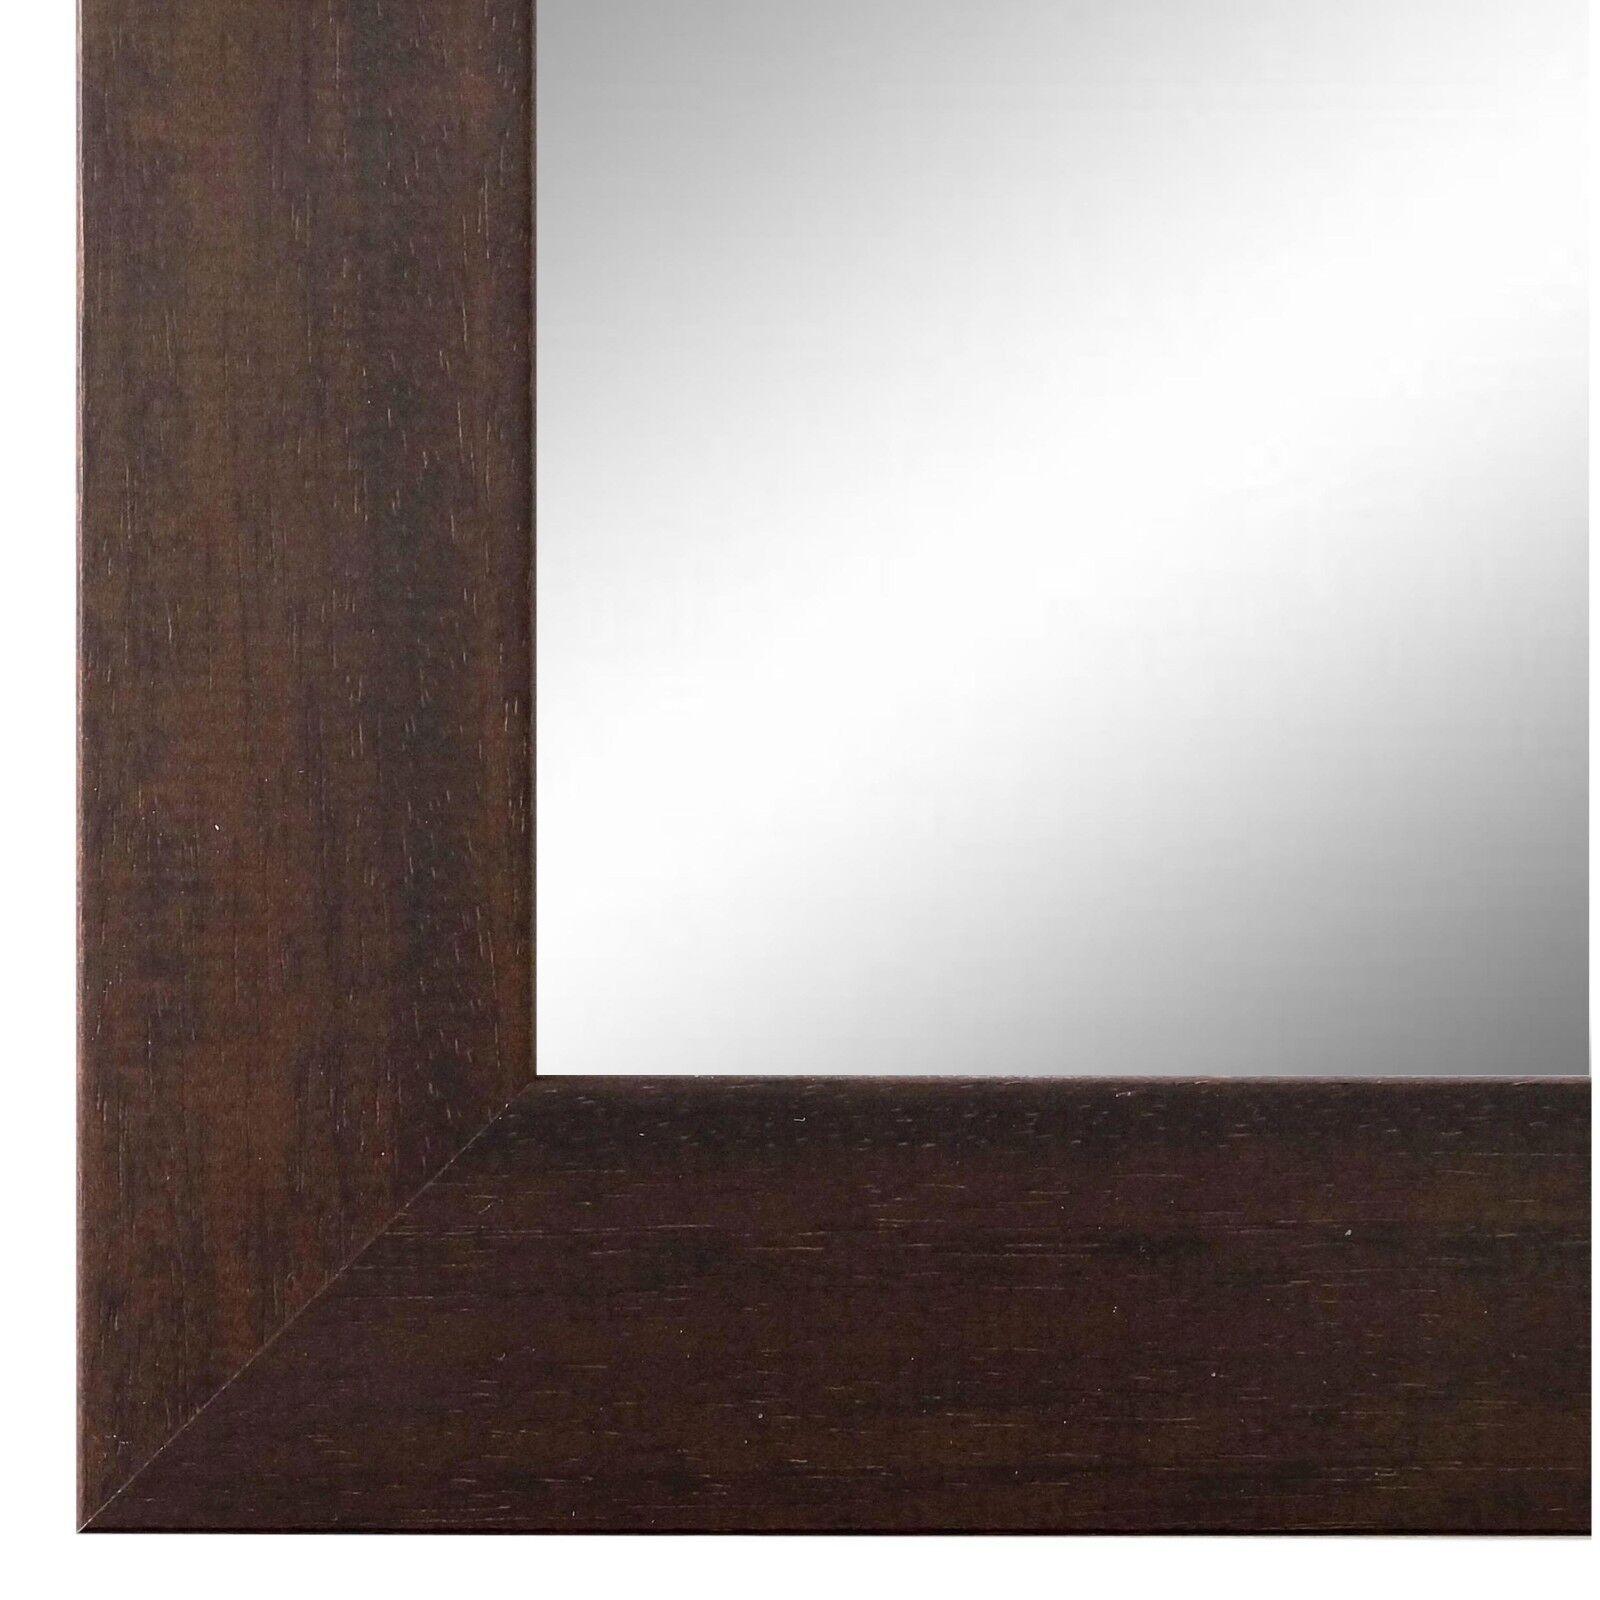 Wandspiegel Spiegel dunkel Braun Modern Retro Holz Florenz 4,0 - NEU alle Größen